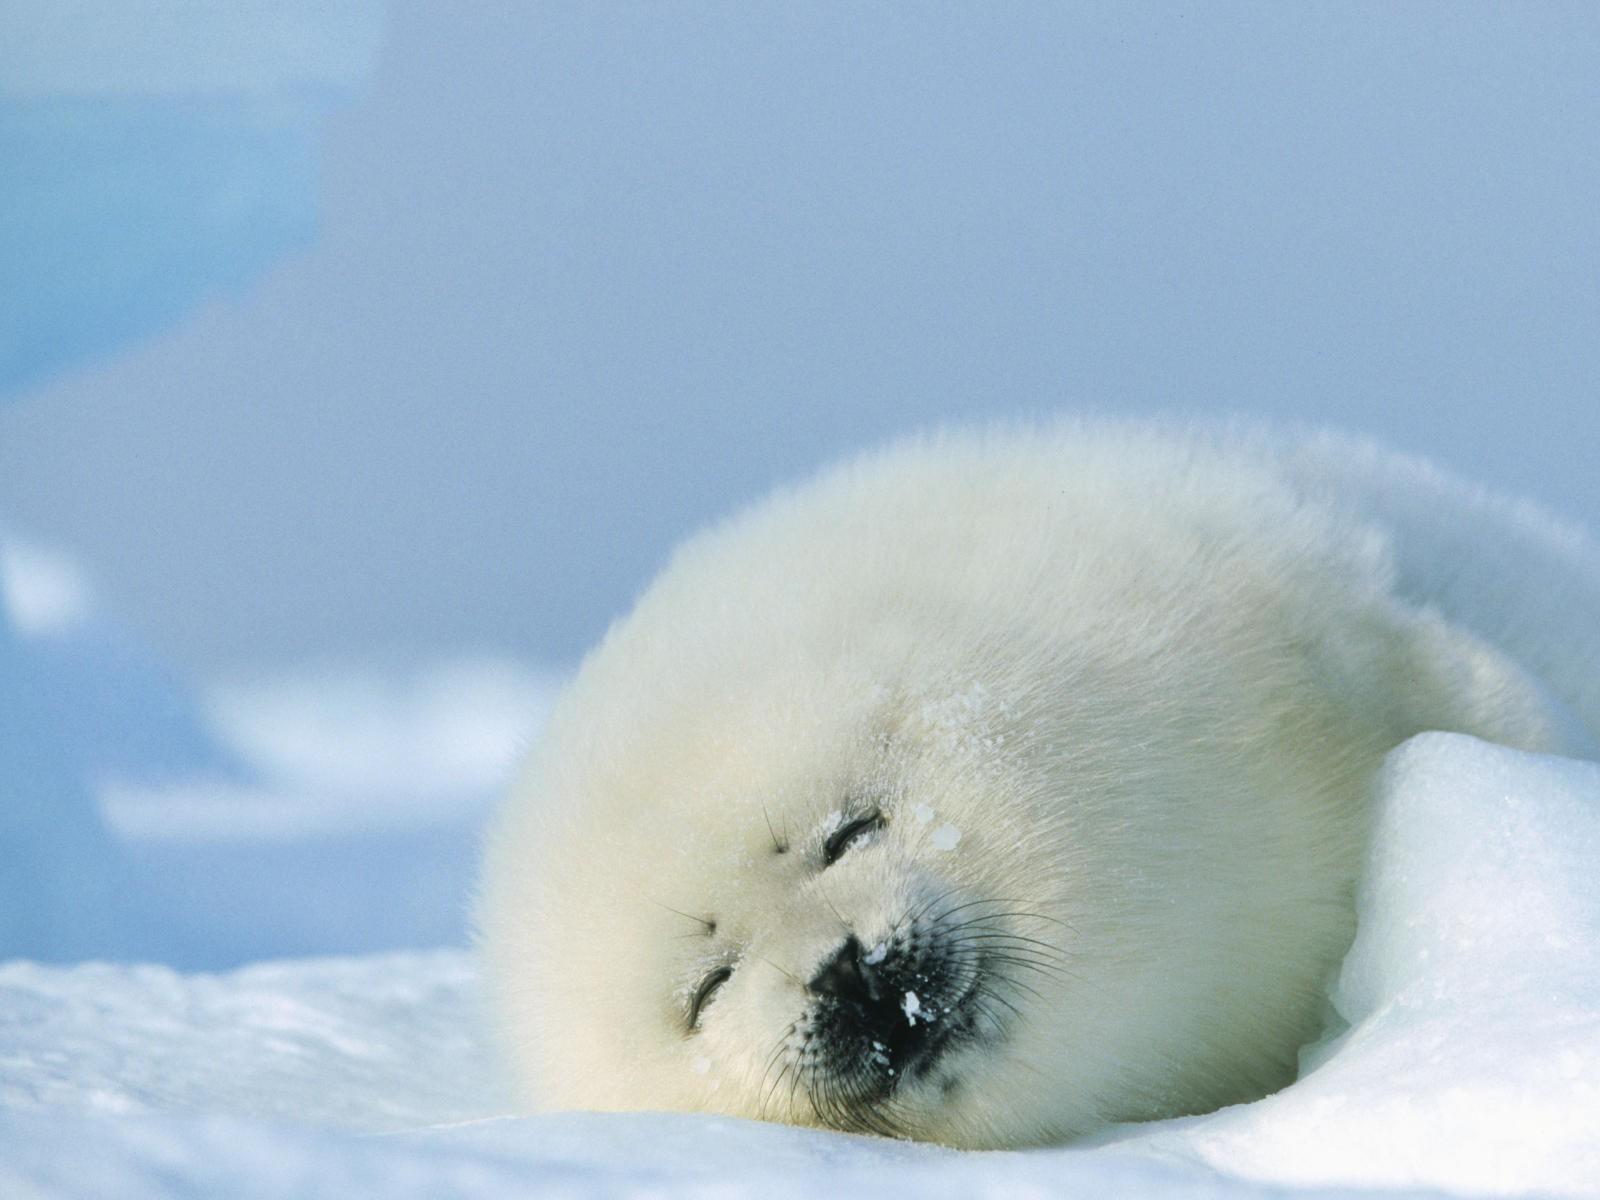 Cute Cartoon Seal Wallpaper Dies Irae 壁紙の記事 その2